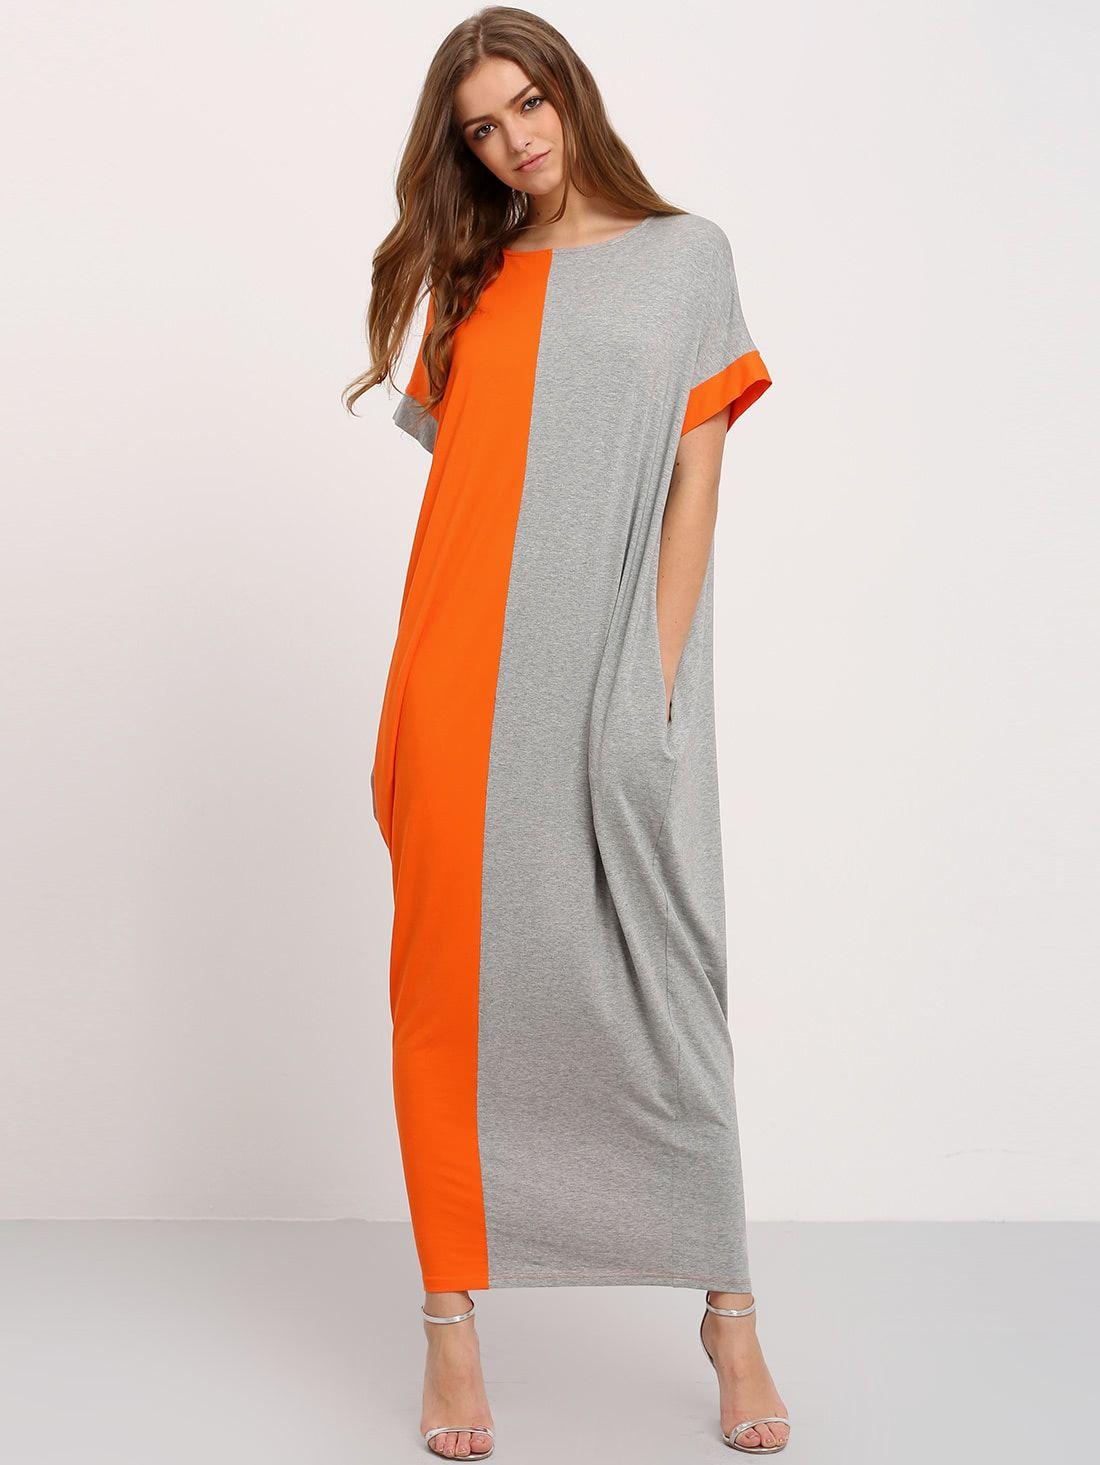 Casual Tunic Colorblock Shift Straight Round Neck Short Sleeve Natural Multicolor Maxi Length Color Block Pockets Maxi Dress Fashion Pocket Maxi Dress Clothes [ 1465 x 1100 Pixel ]